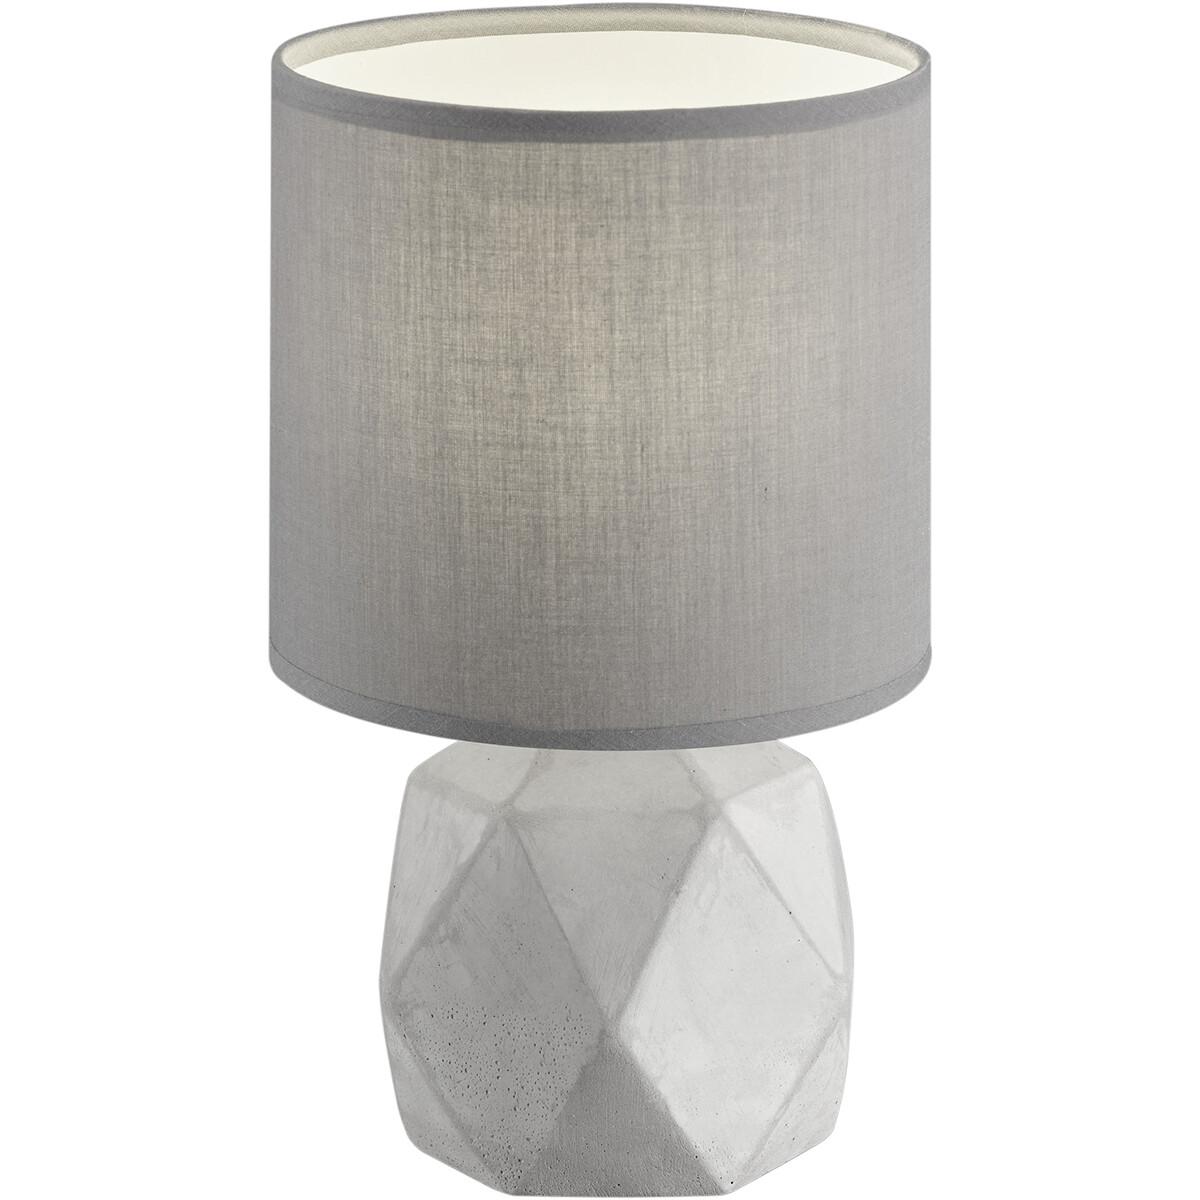 LED Tafellamp - Tafelverlichting - Trion Pikanto - E14 Fitting - Rond - Mat Titaan - Beton